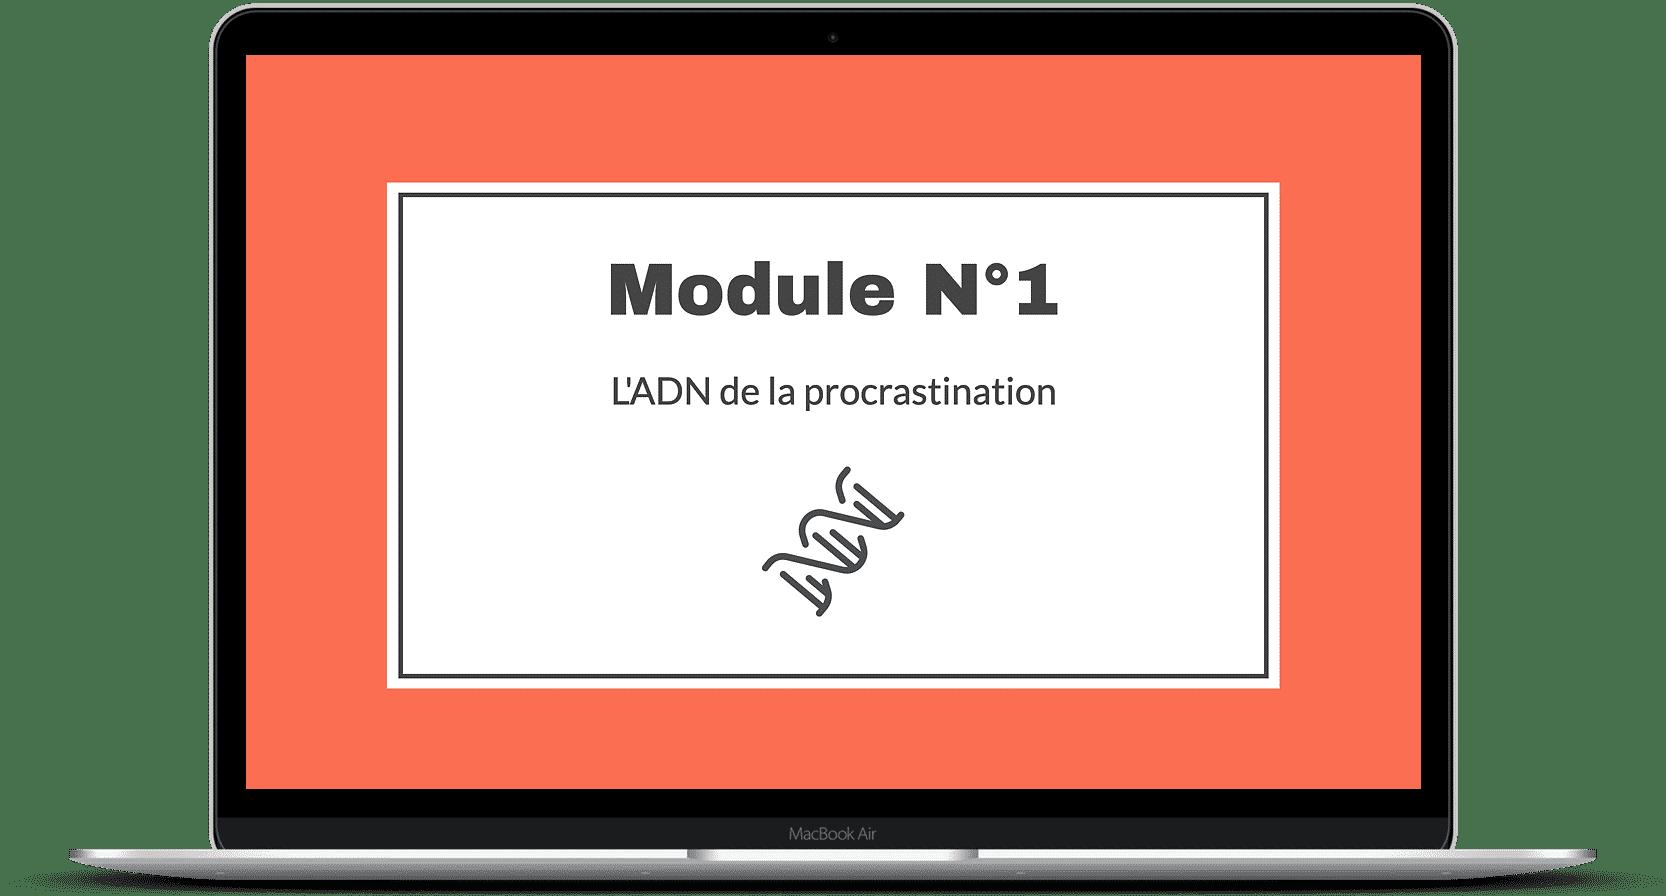 procrastination bénéfique module 1